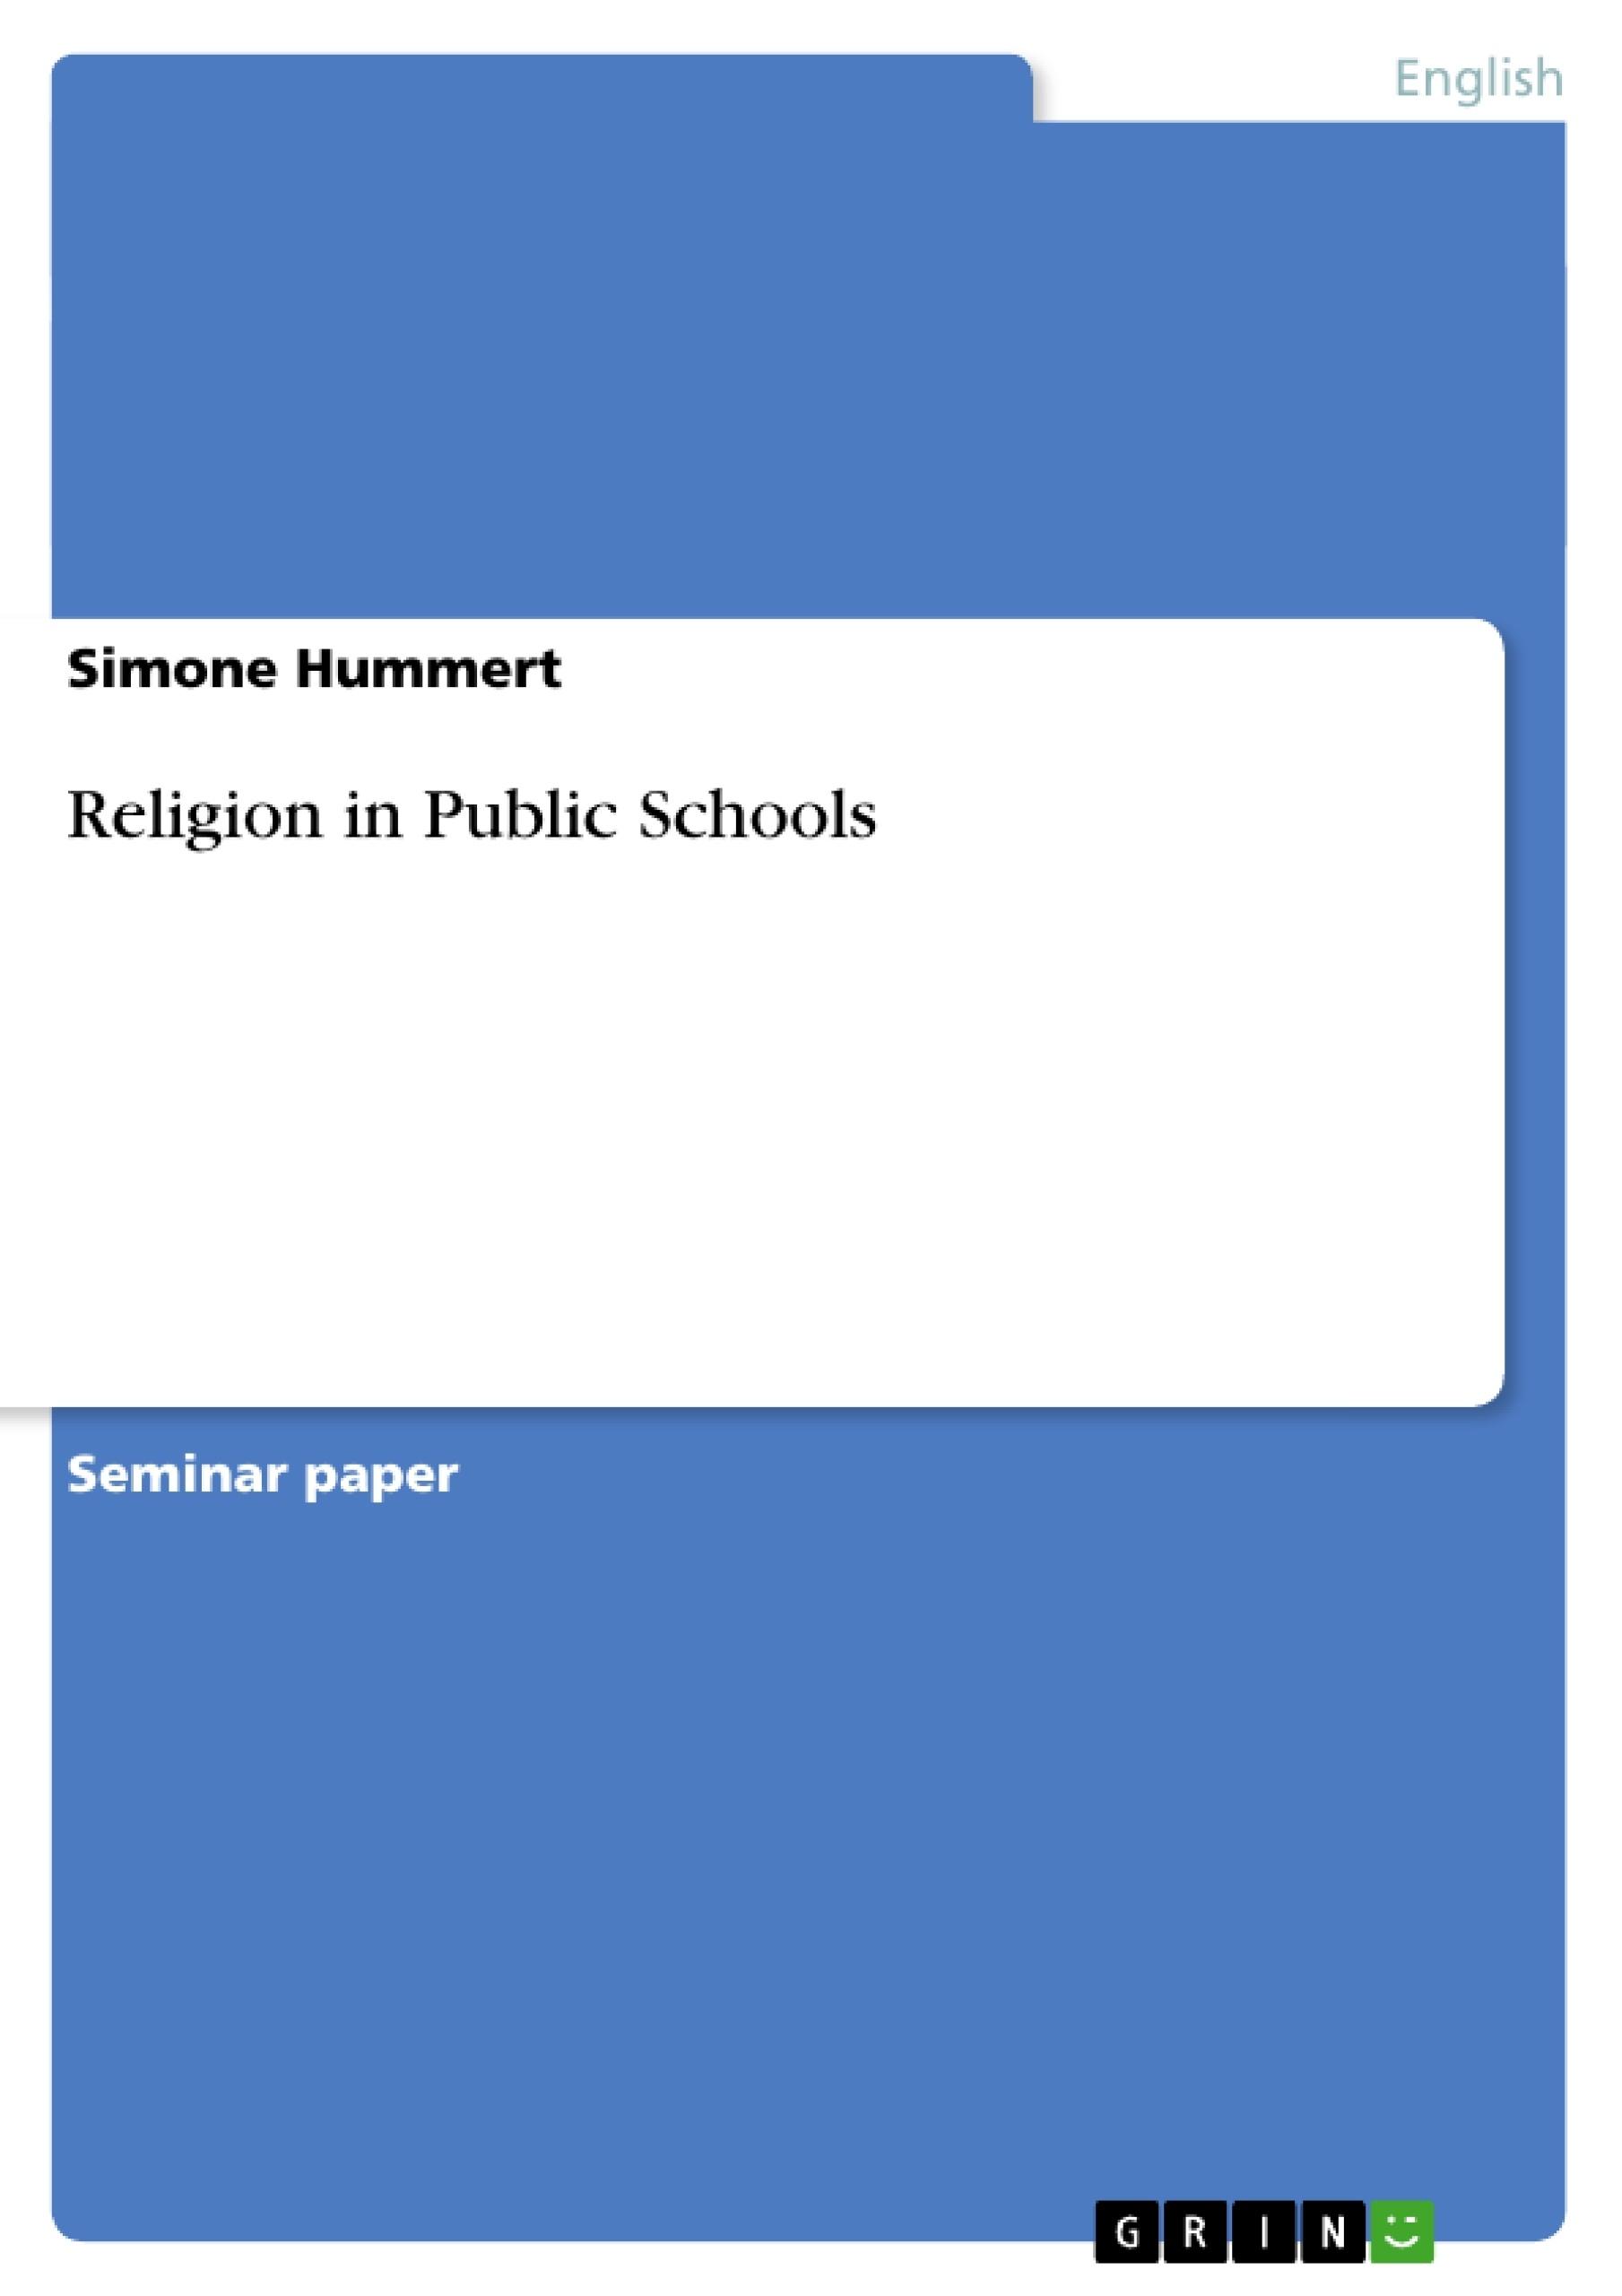 Title: Religion in Public Schools